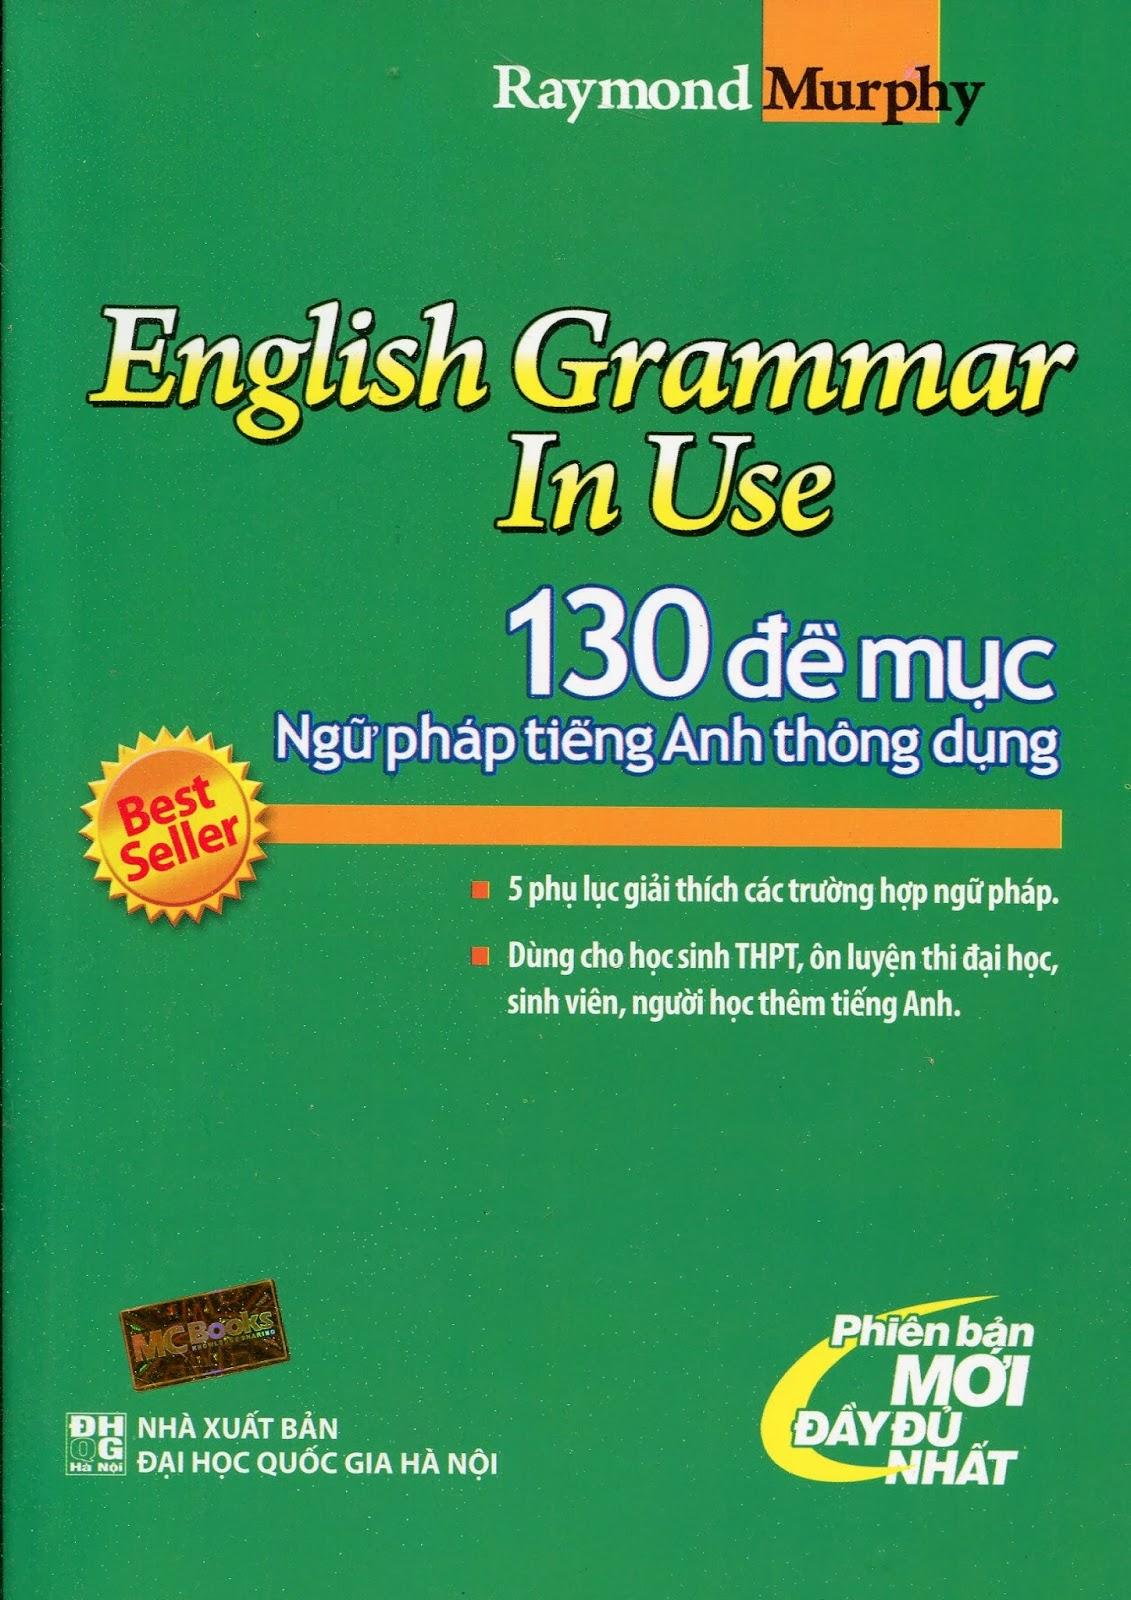 Raymond Murphy on English Grammar in Use - YouTube